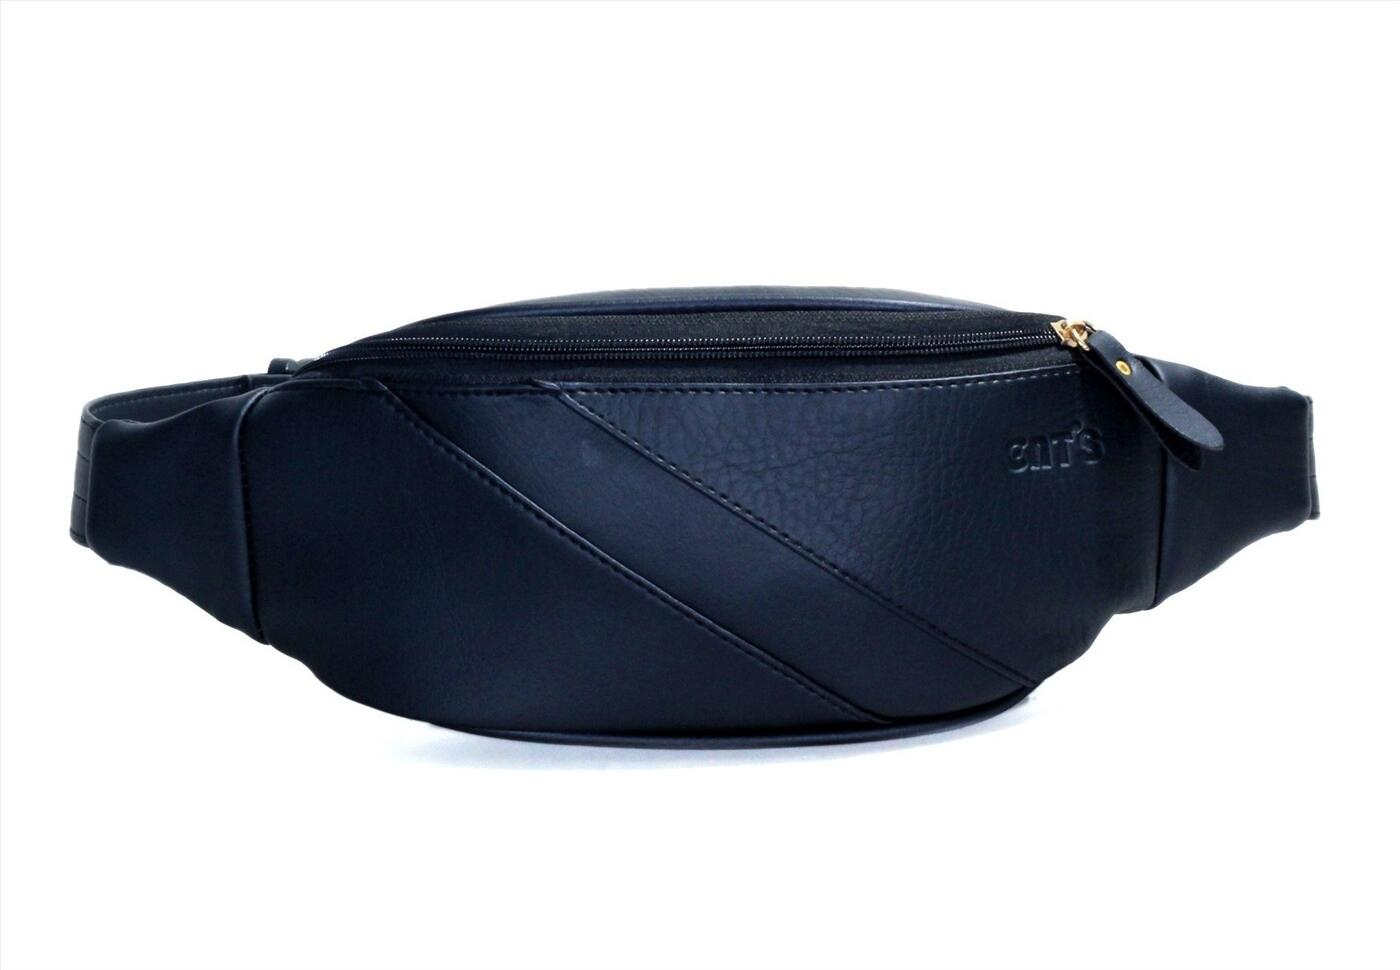 Túi da đeo ngực CNT unisex TĐX40 cá tính Đen